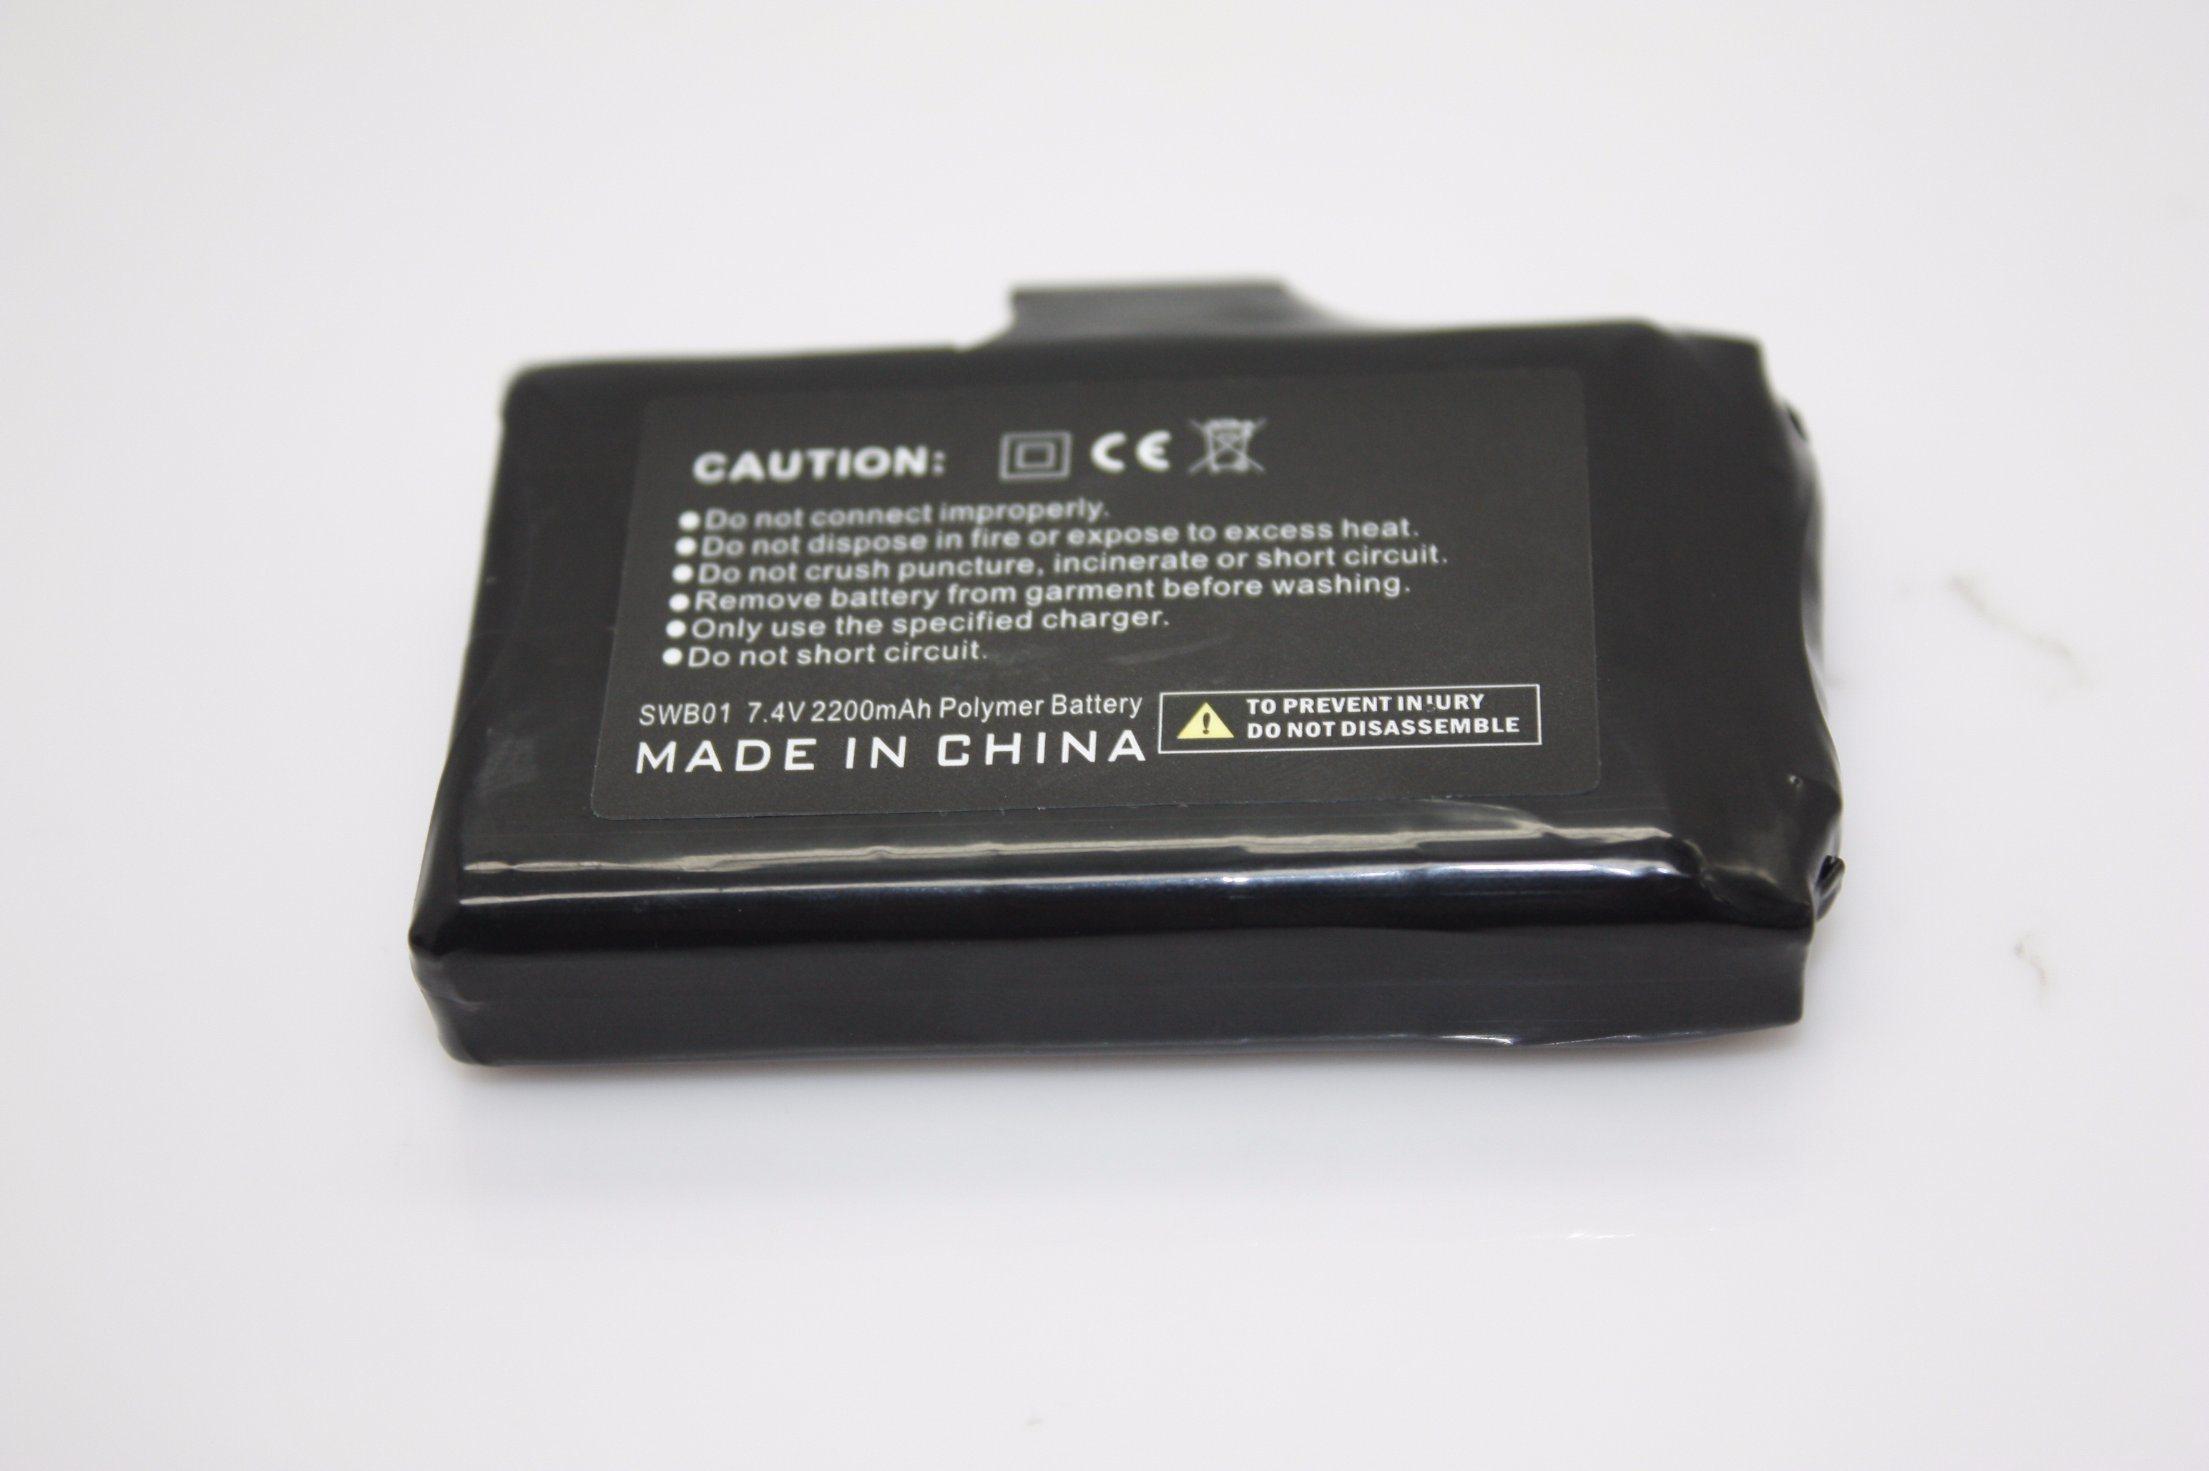 7.4V, 2200mAh Battery for Heated Glove(GB-2000)